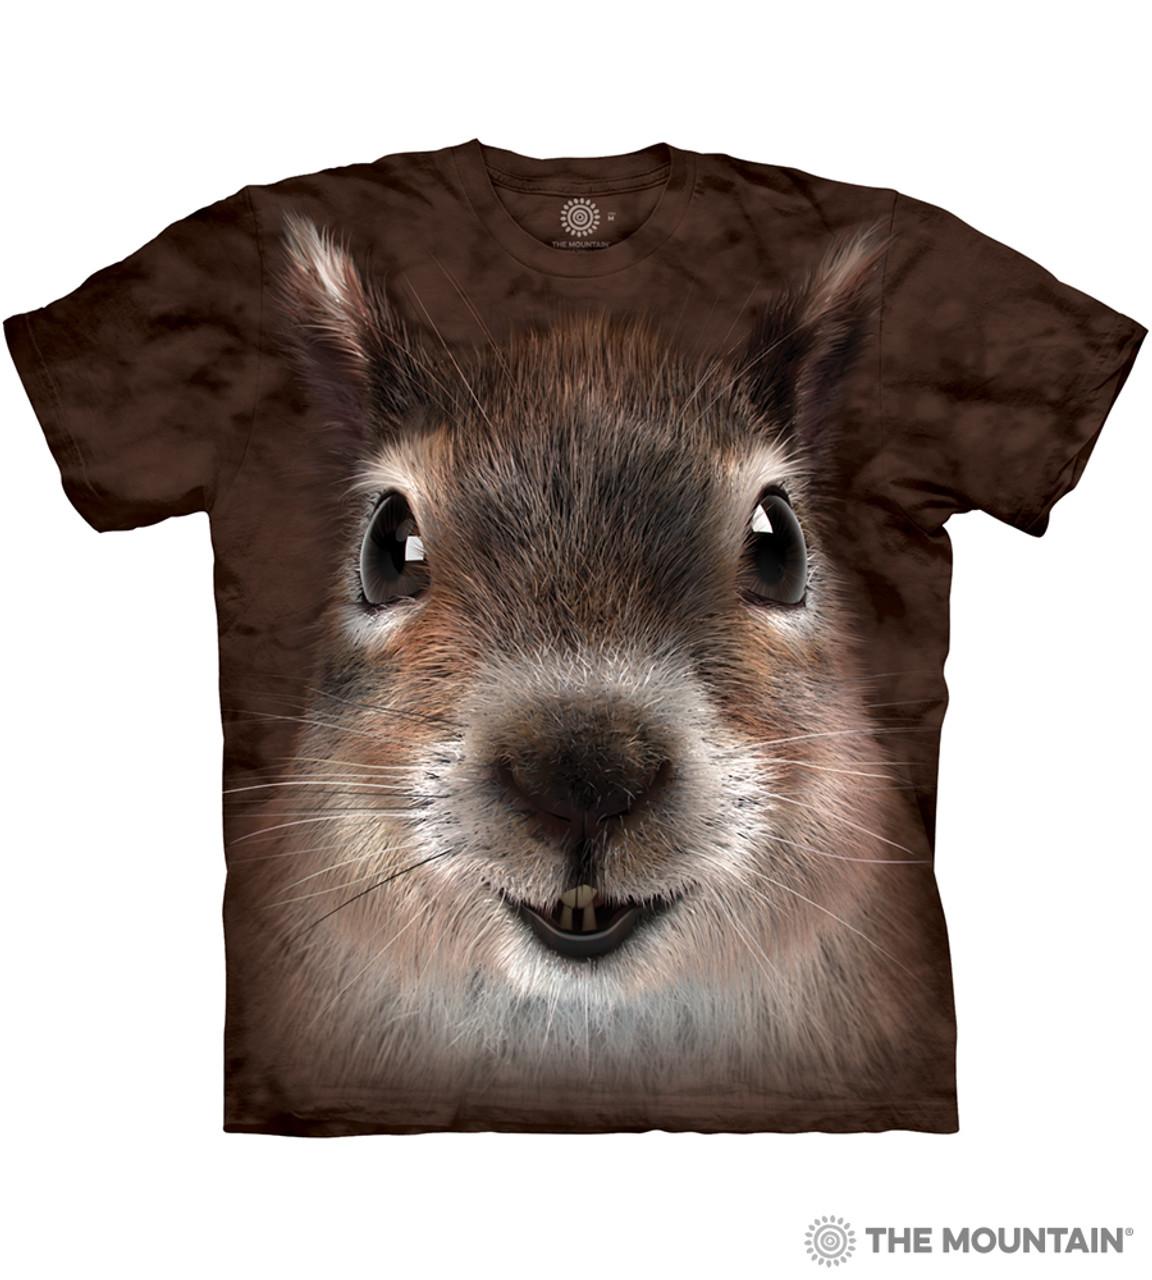 b8c7b6d238fd The Mountain Adult Unisex T-Shirt - Squirrel Face